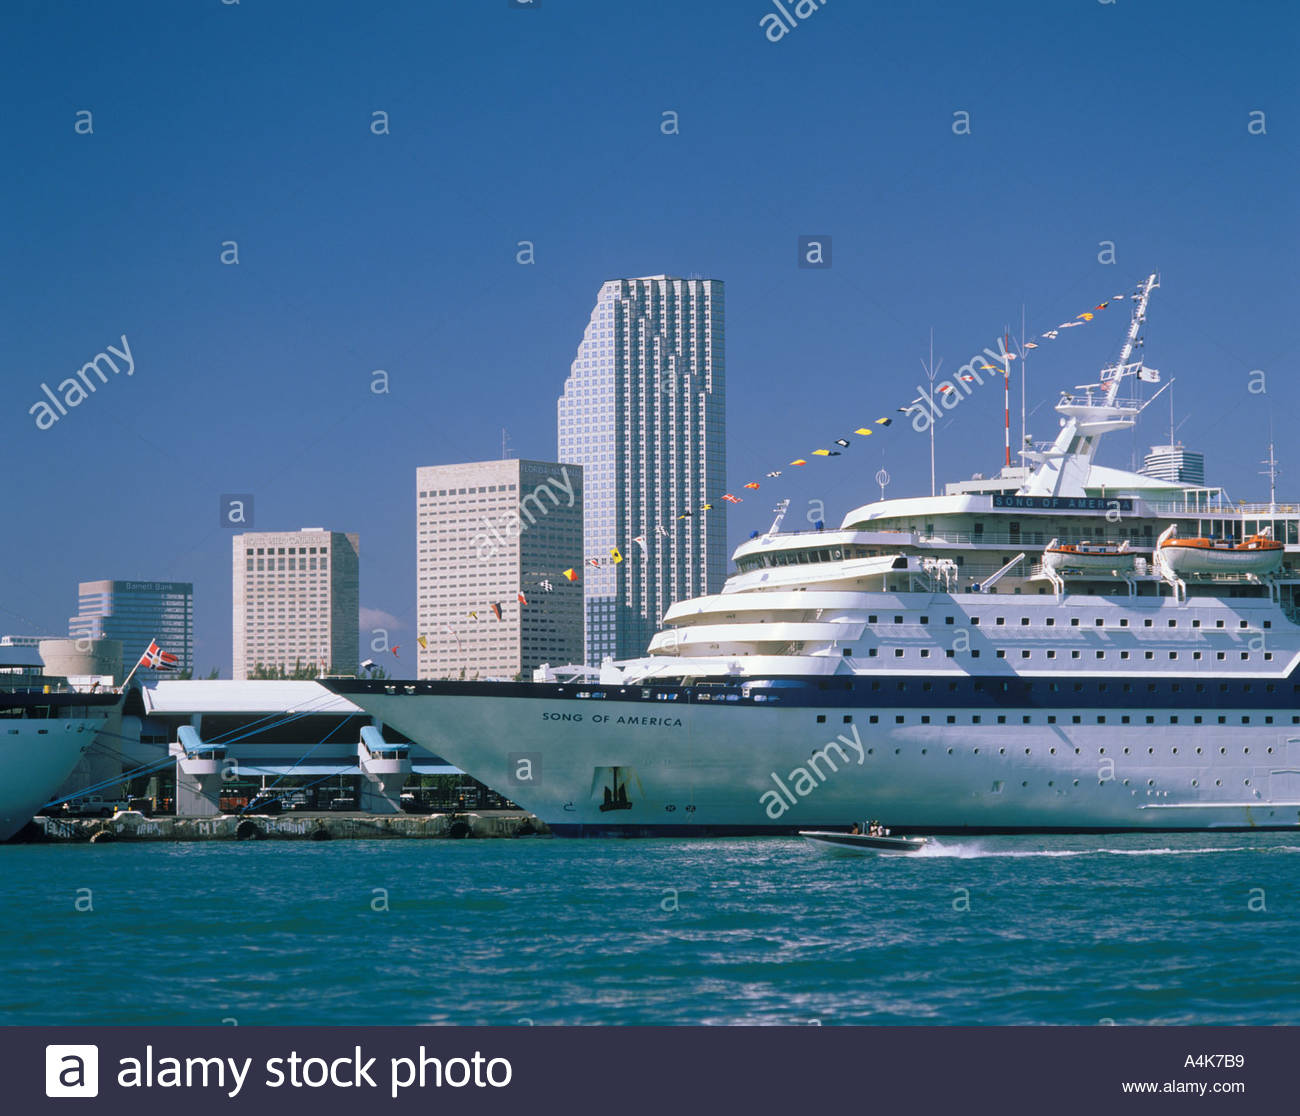 Miami Cruise Terminal: Song Of Amarica In Cruise Port Miami Florida USA Stock